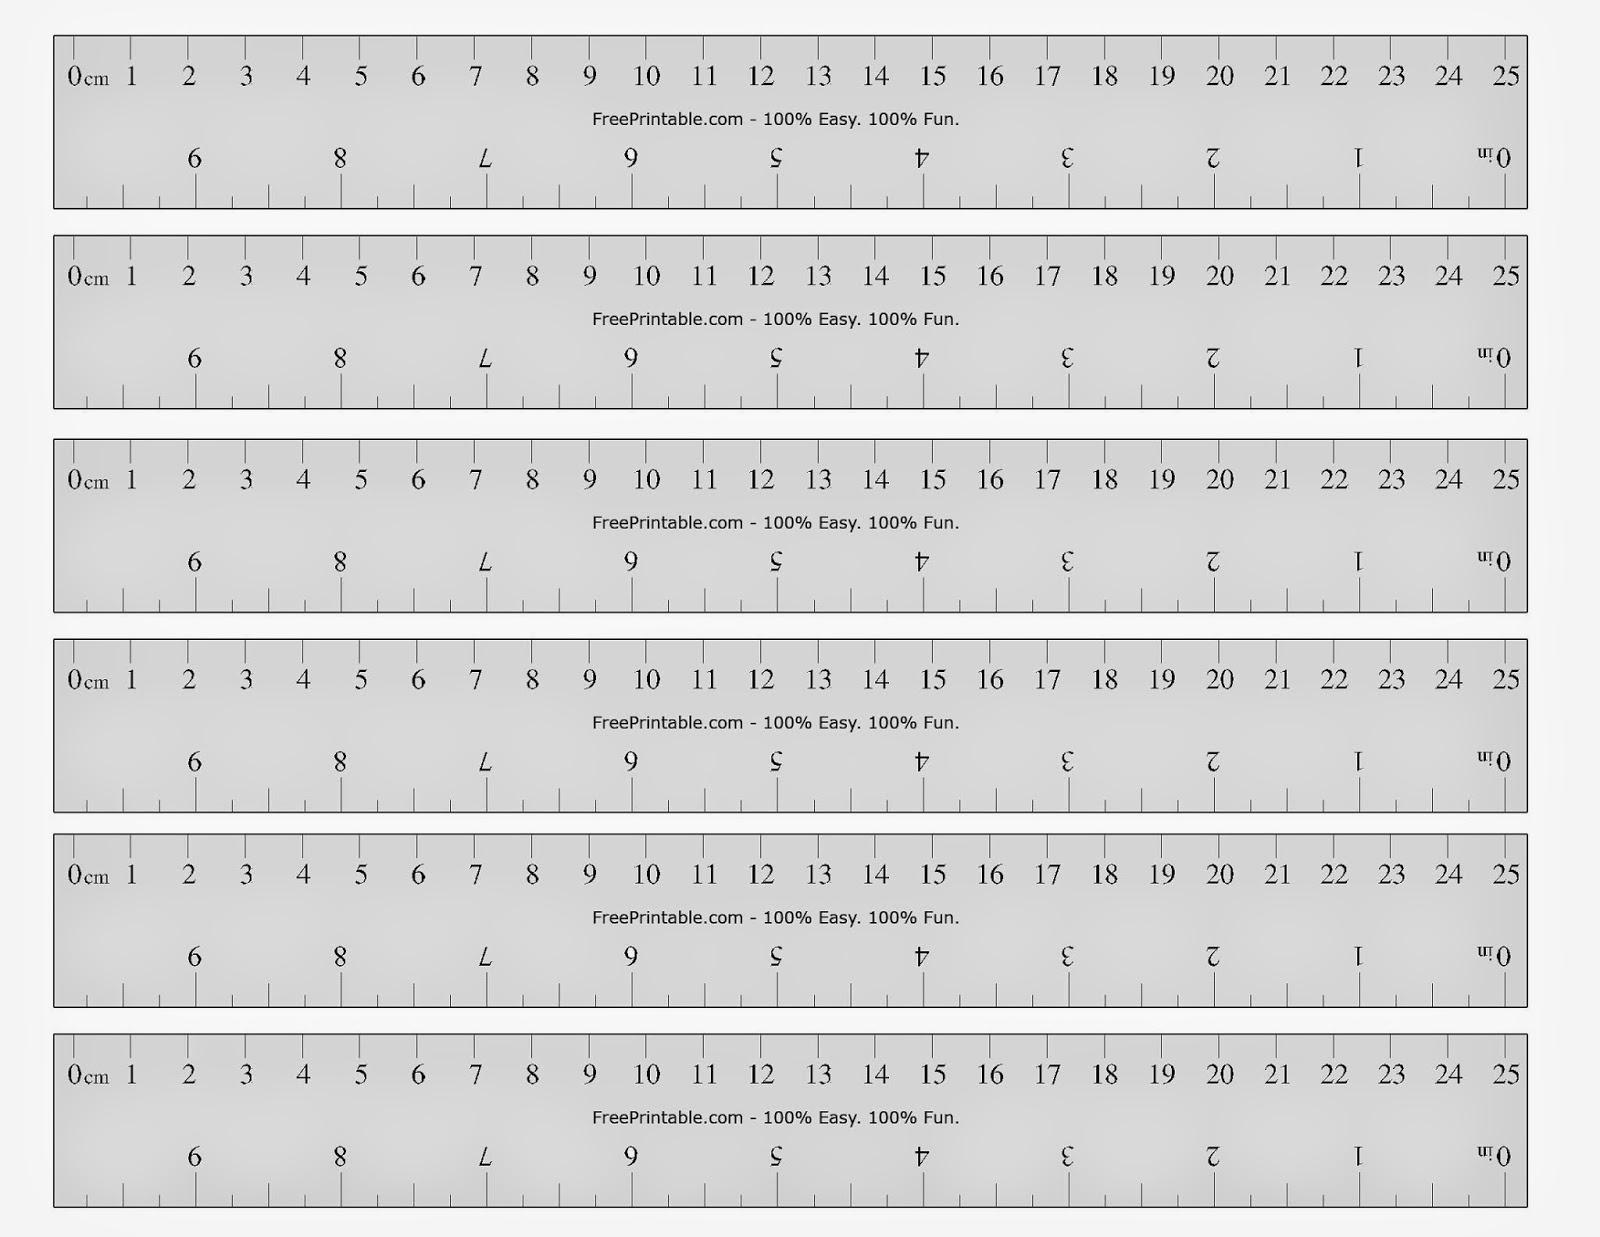 Free Printable Cards 2019: Free Printable Ruler - Free Printable Ruler